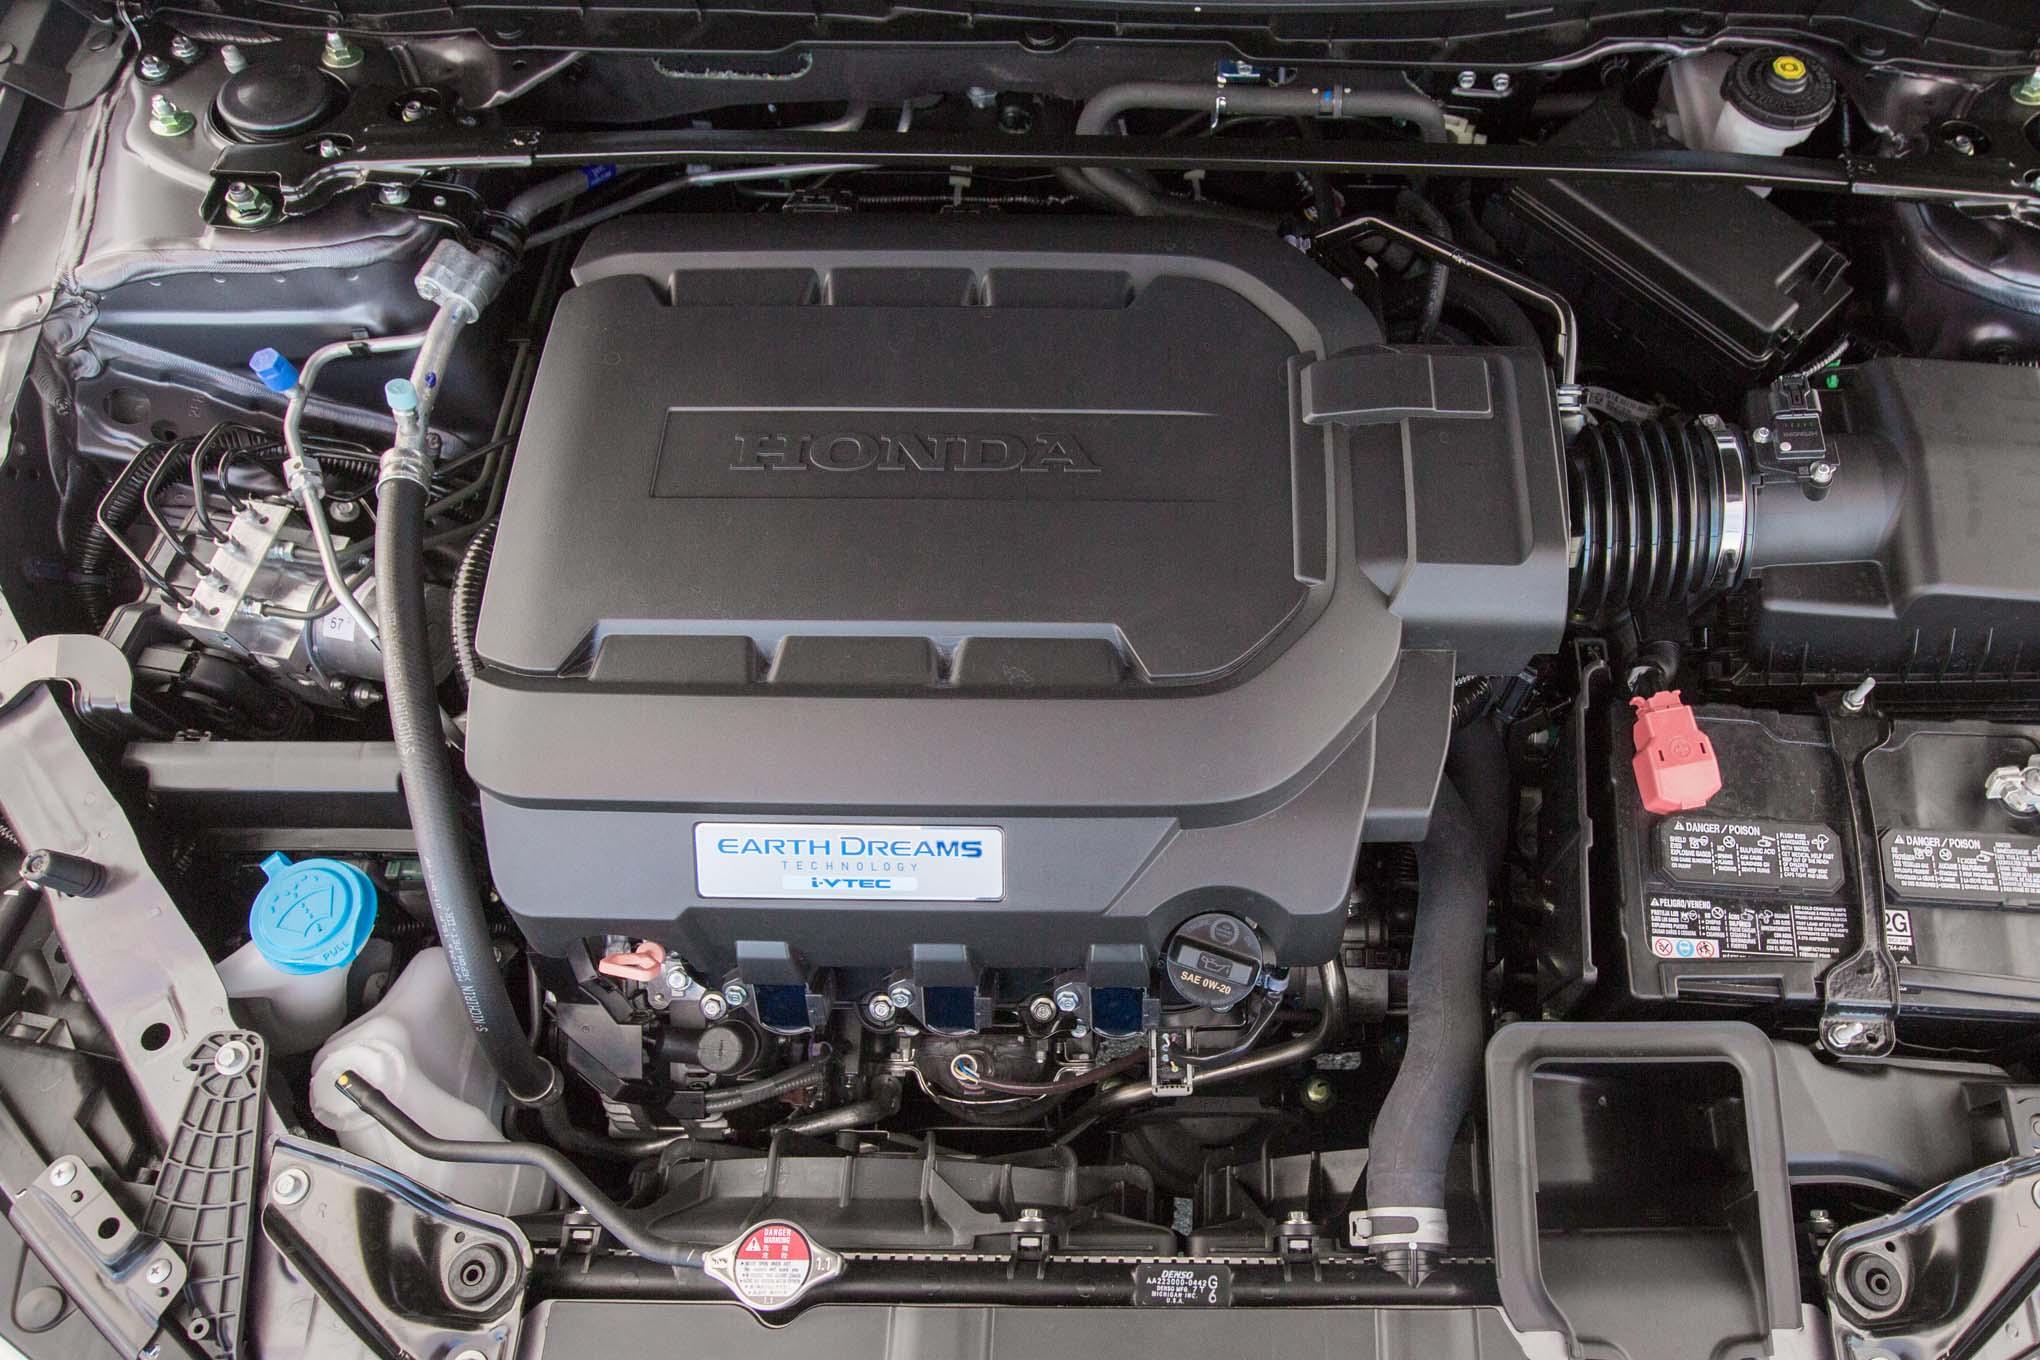 2017 Honda Accord V6 Touring Engine 1